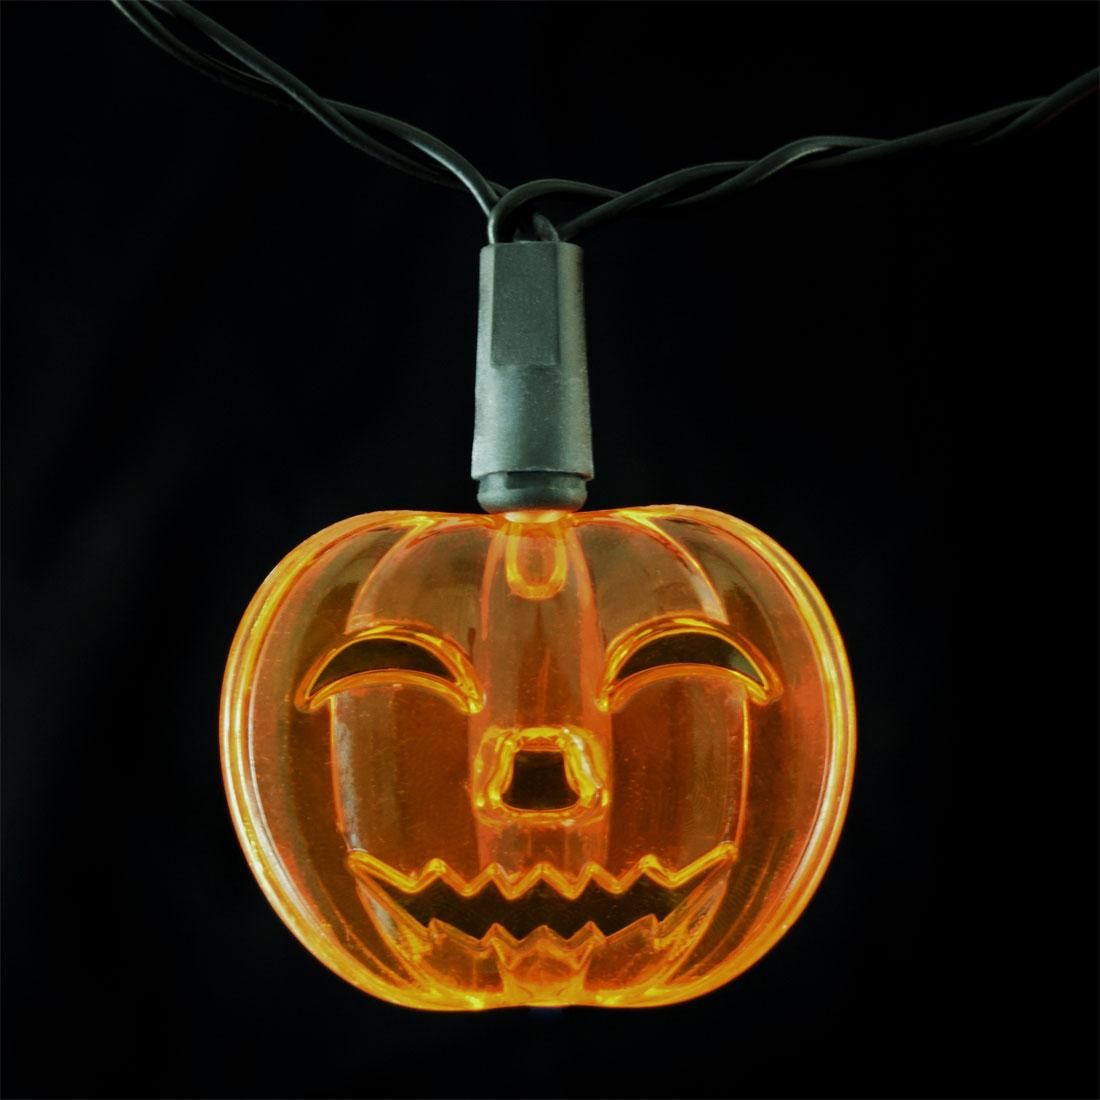 Pumpkin LED String Lights - Battery Operated - 10 Lights